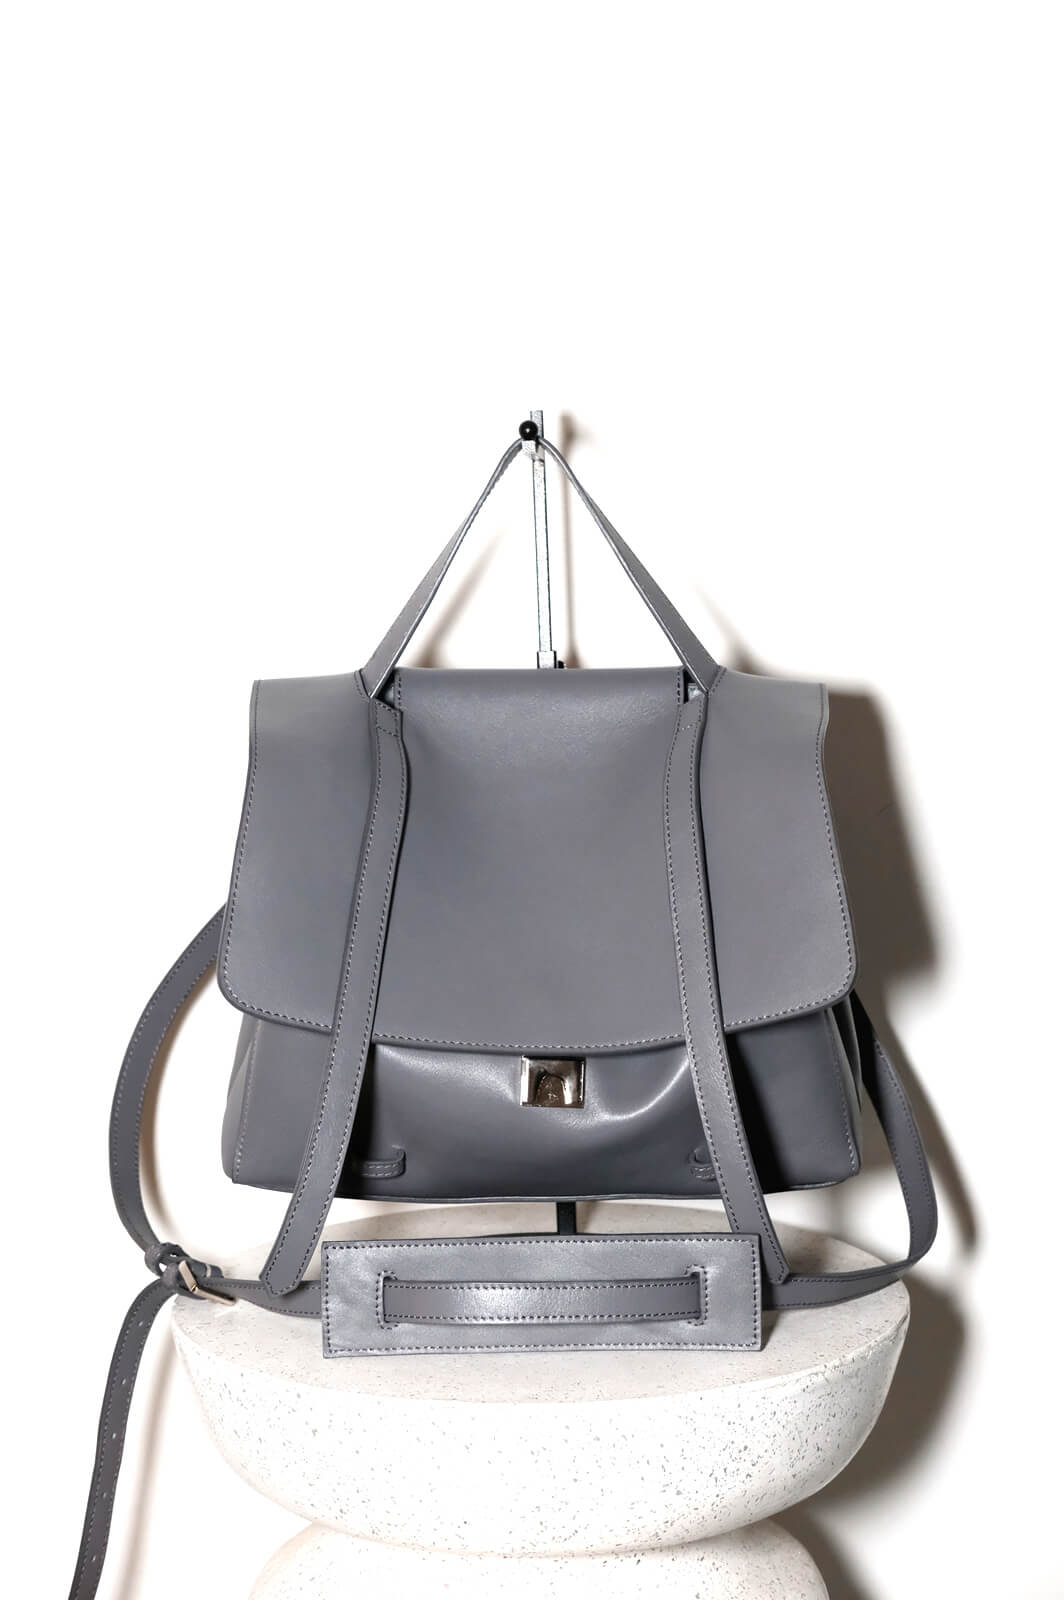 DC-Nobis Bag